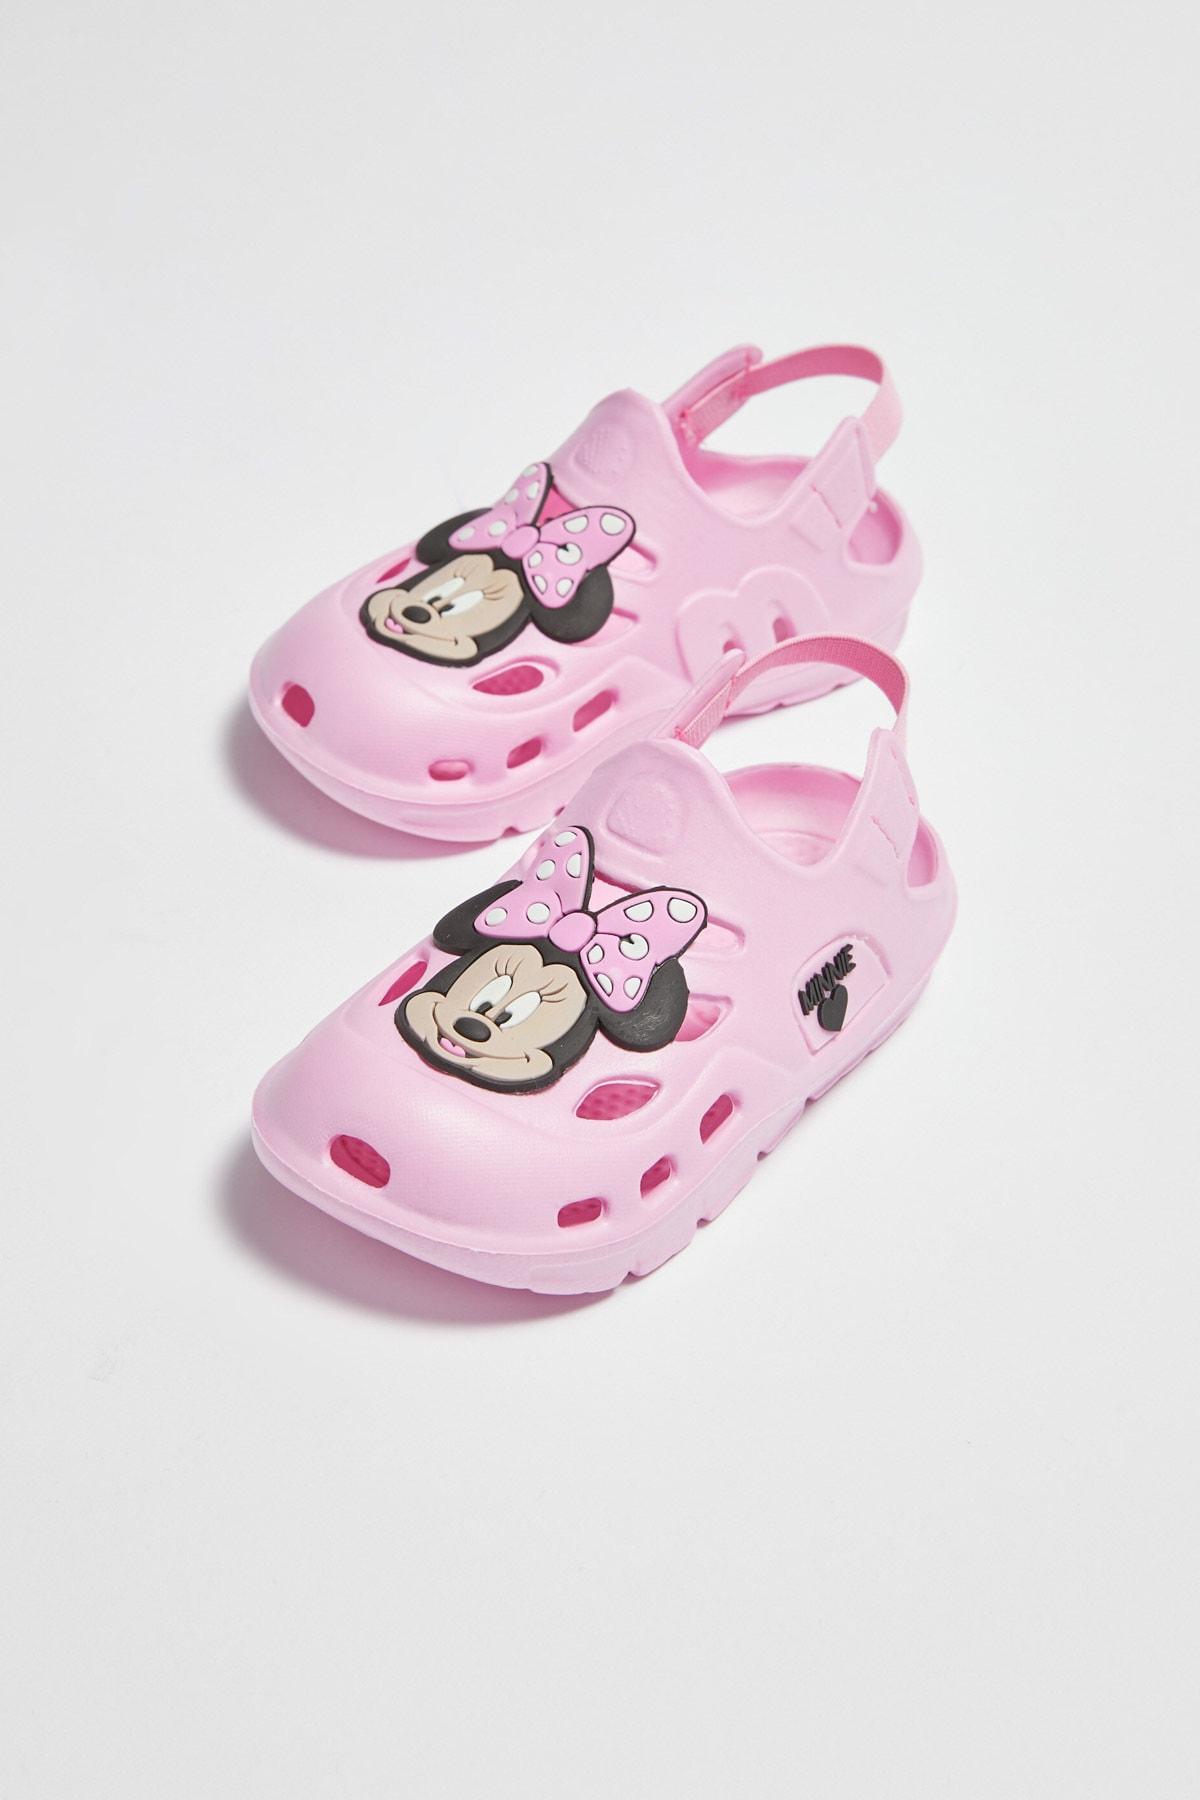 LC Waikiki Kız Bebek Açık Pembe Dmq Sandalet 2